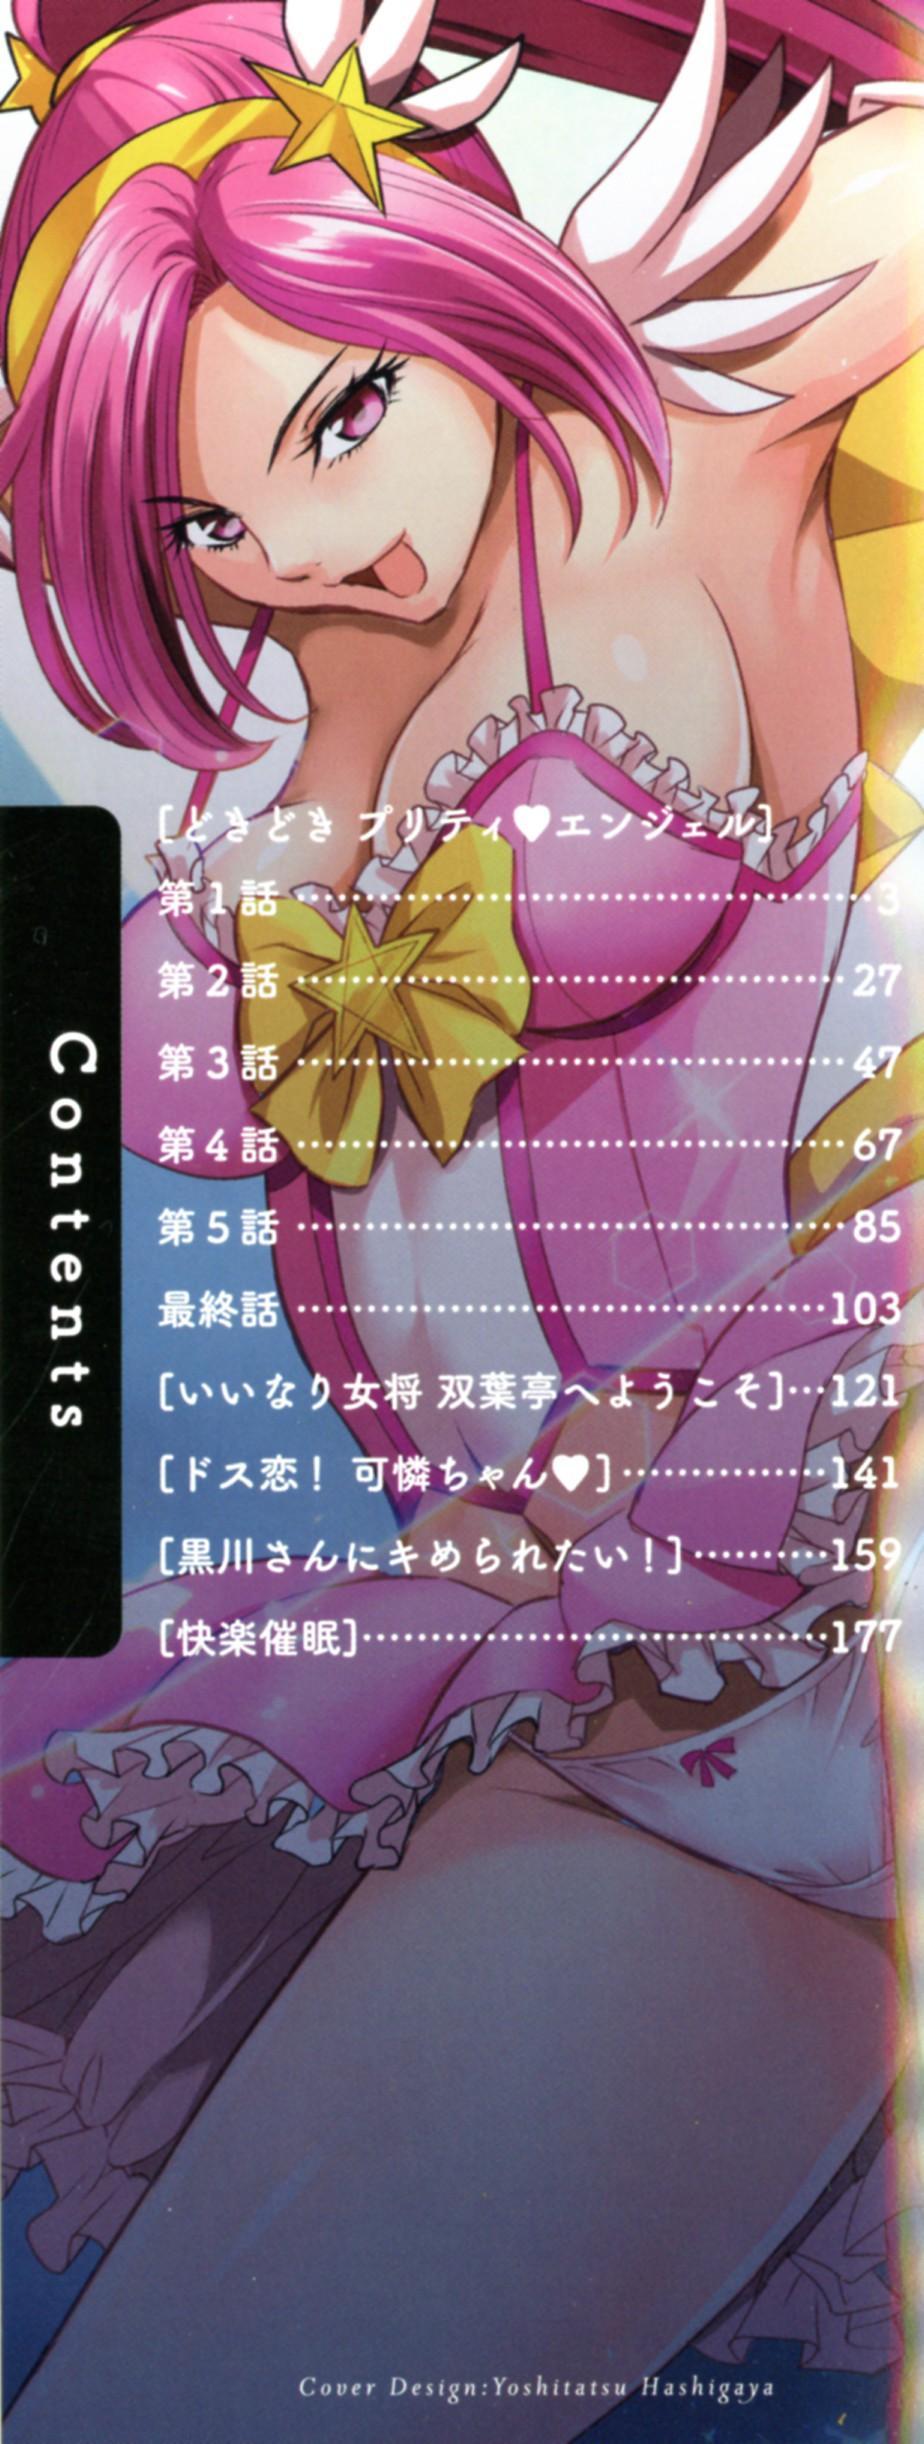 Dokidoki Pretty Angel 2